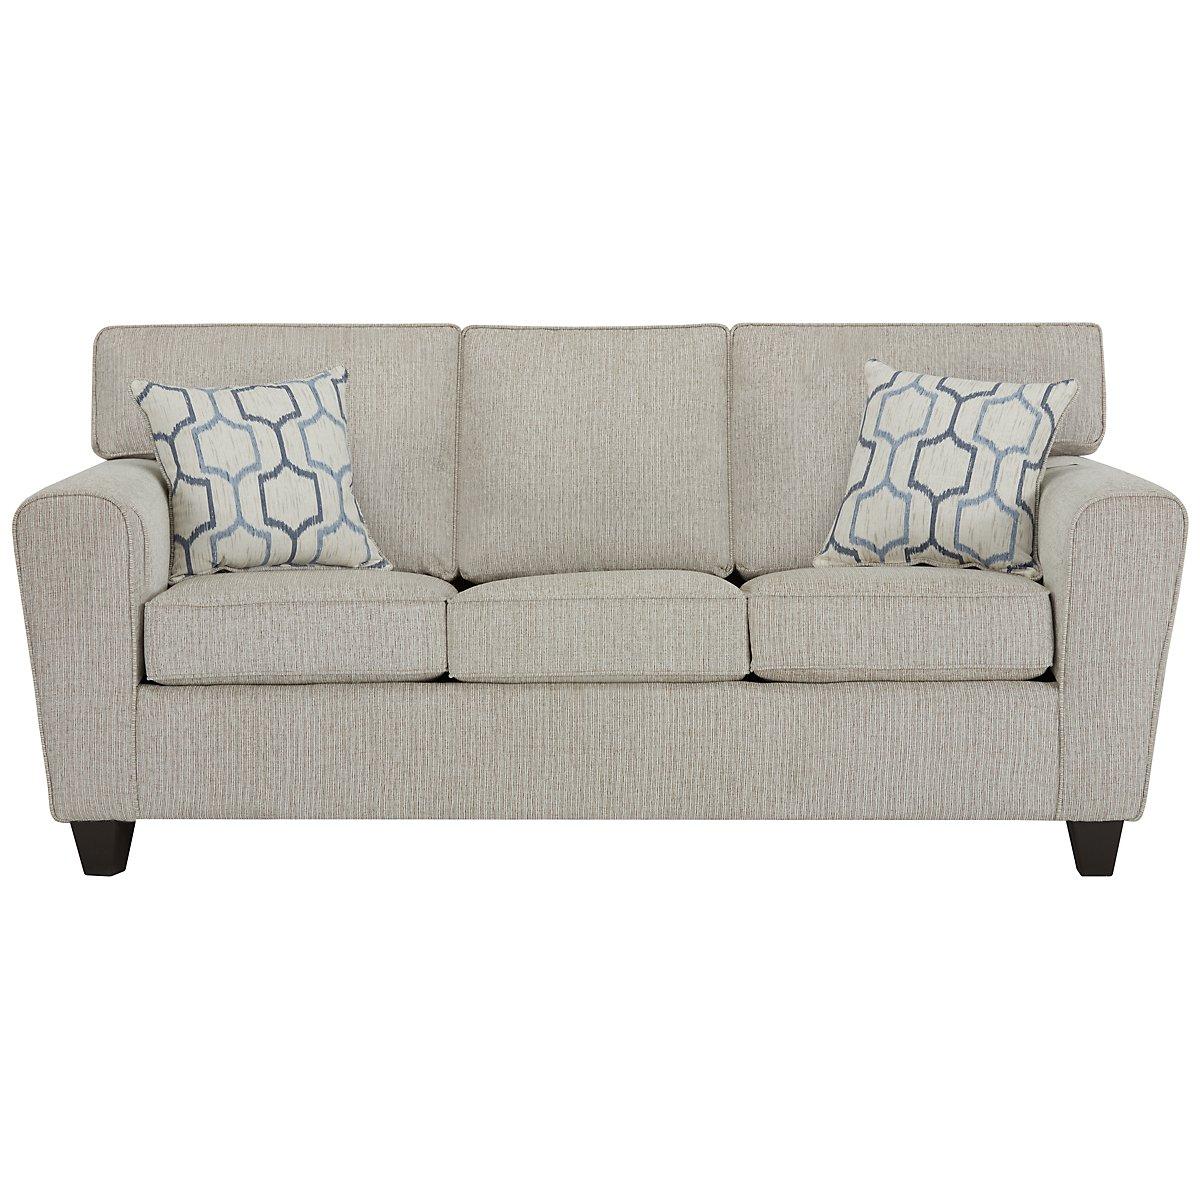 City Furniture Zoey Lt Beige Microfiber Sofa